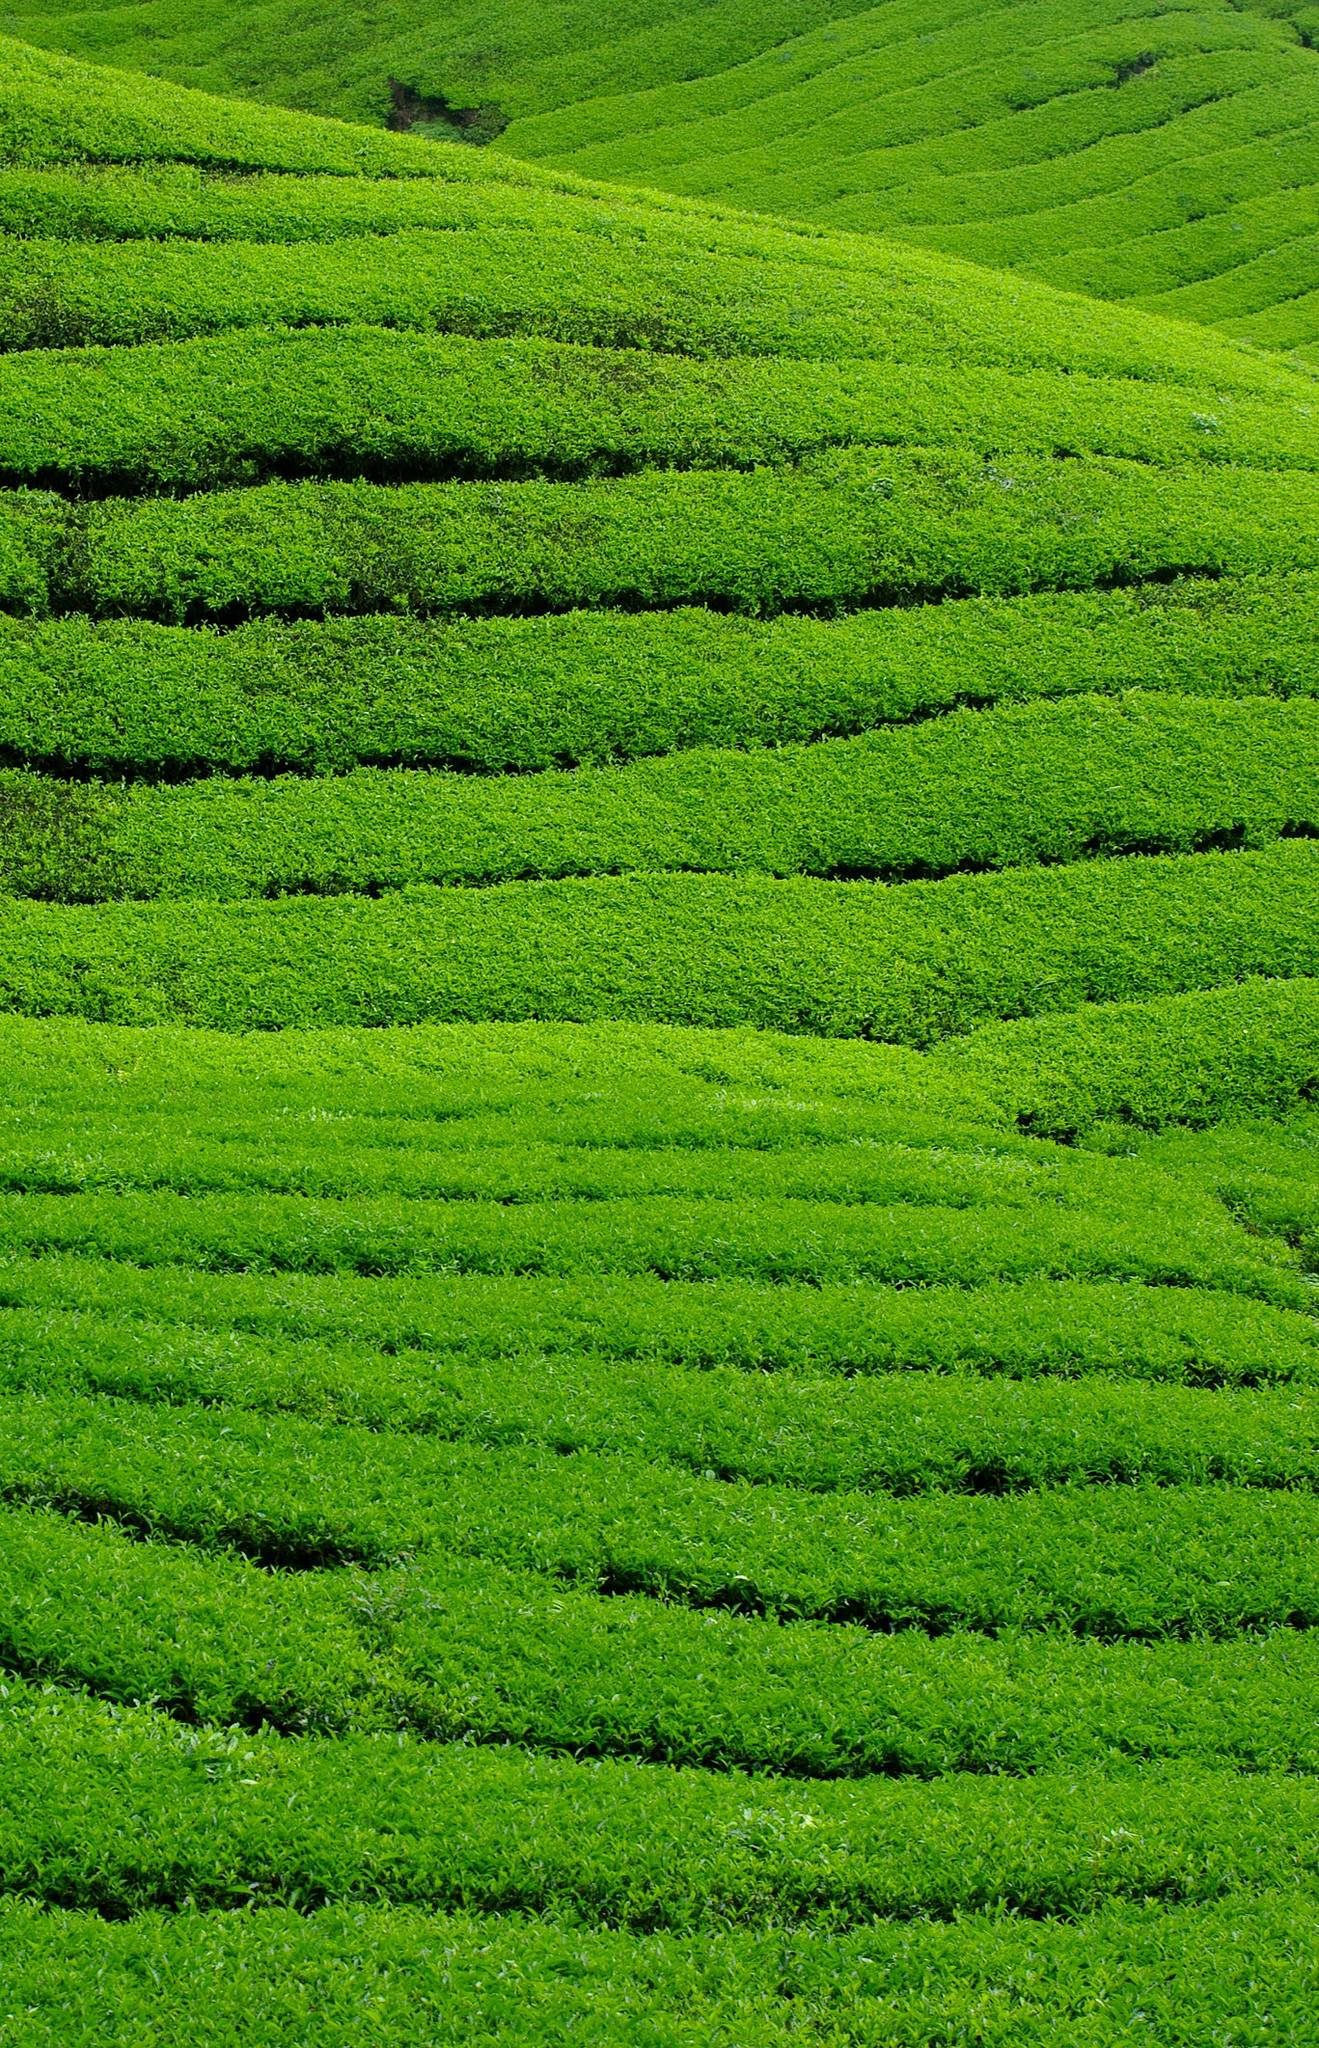 Photo 1: Cameron Highlands, balade dans les plantations de thé